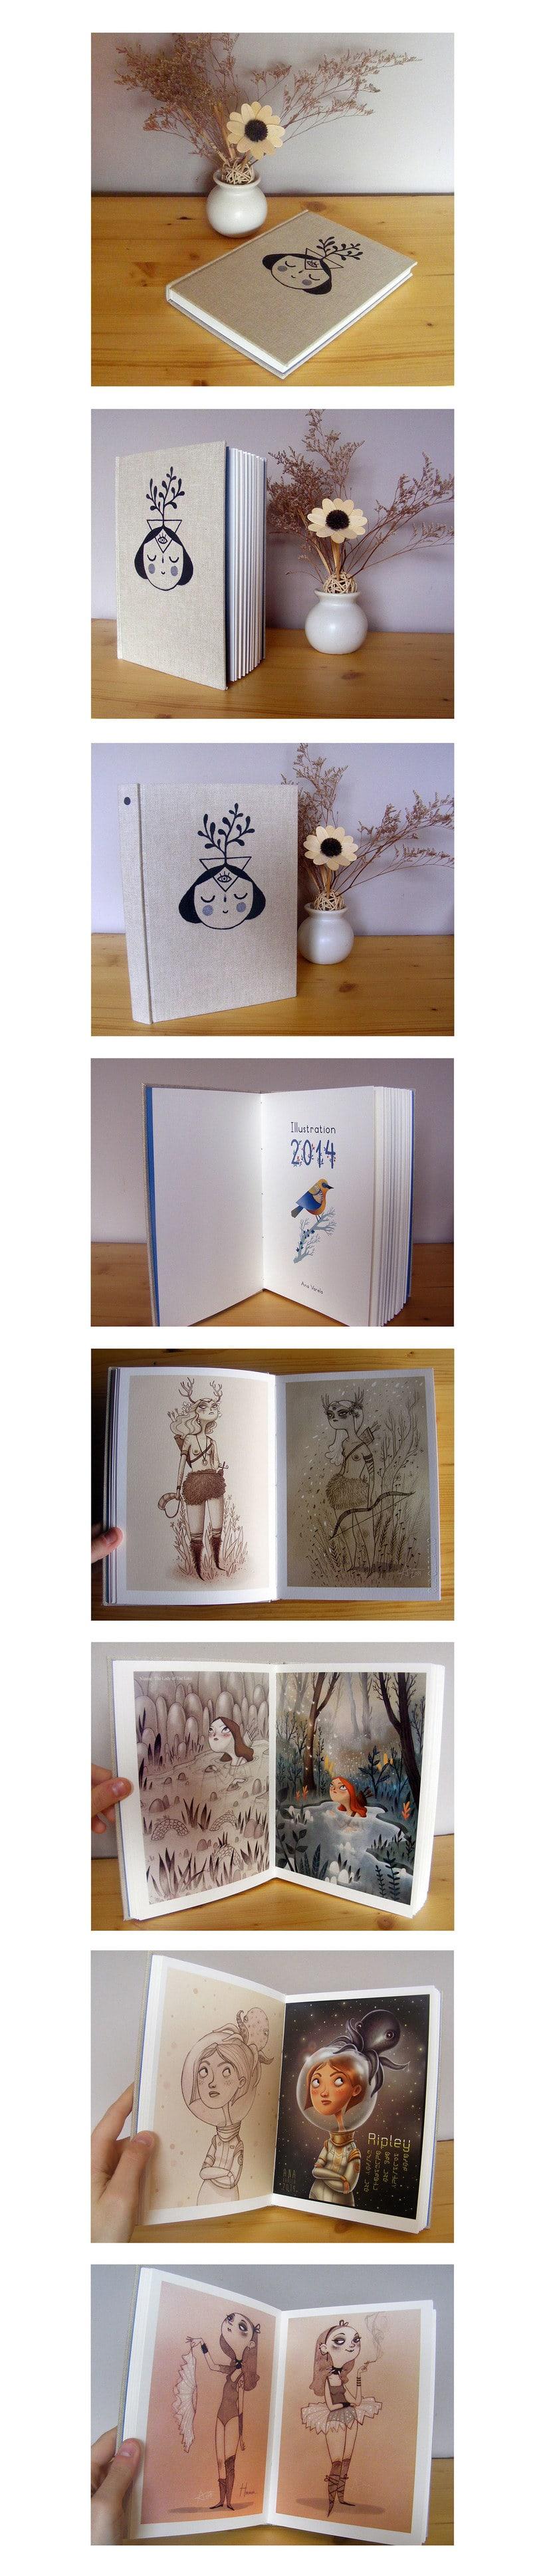 Compilation Books 1